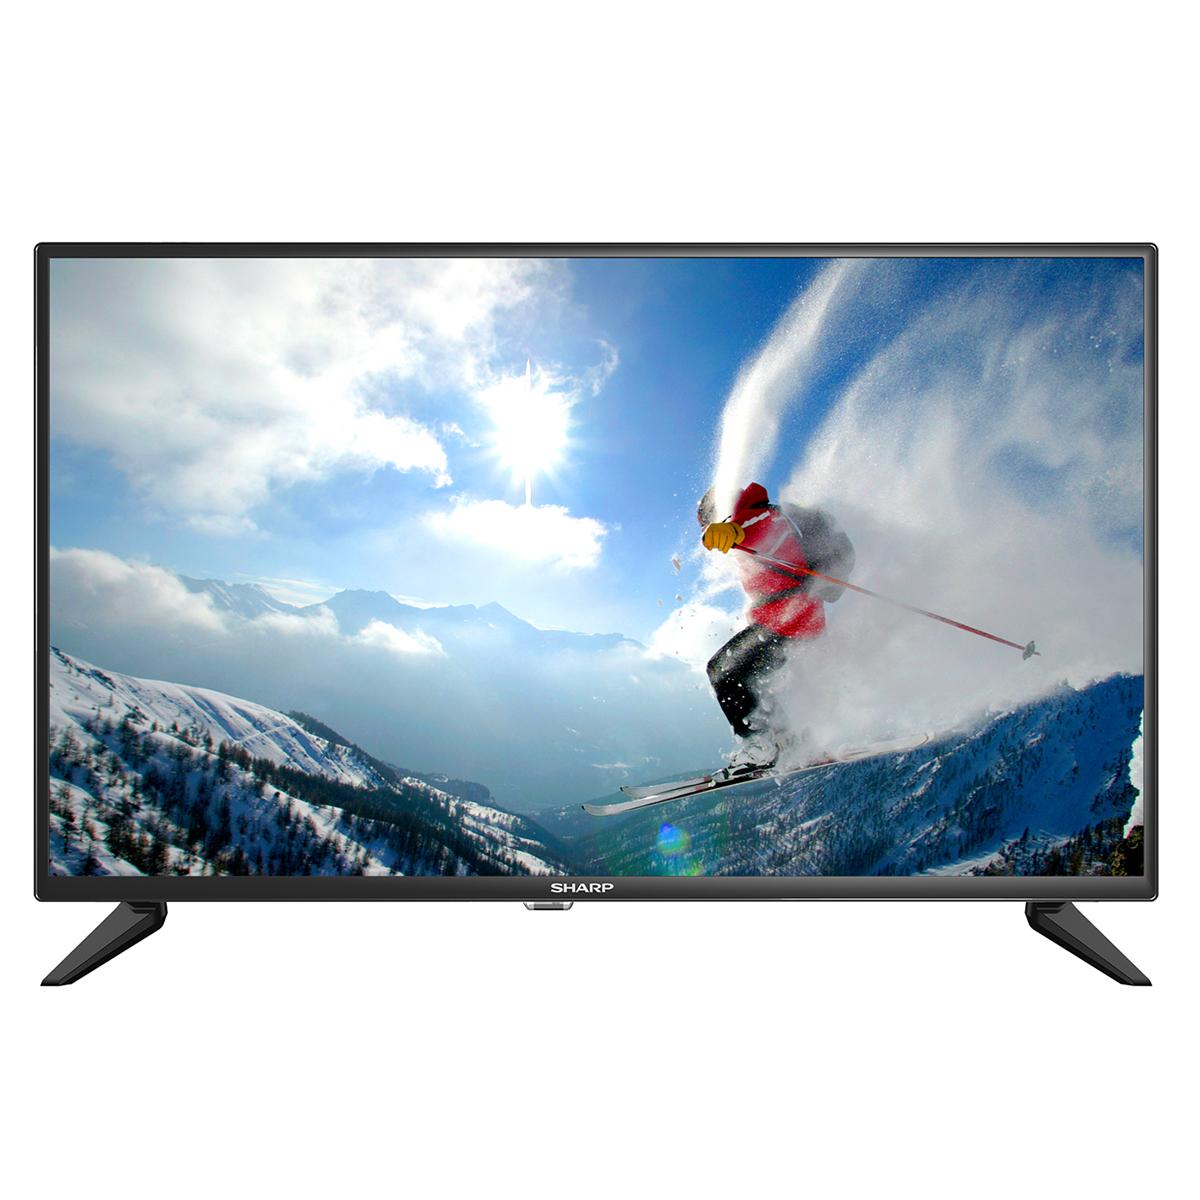 YMMV Sharp 32 Smart TV for $30